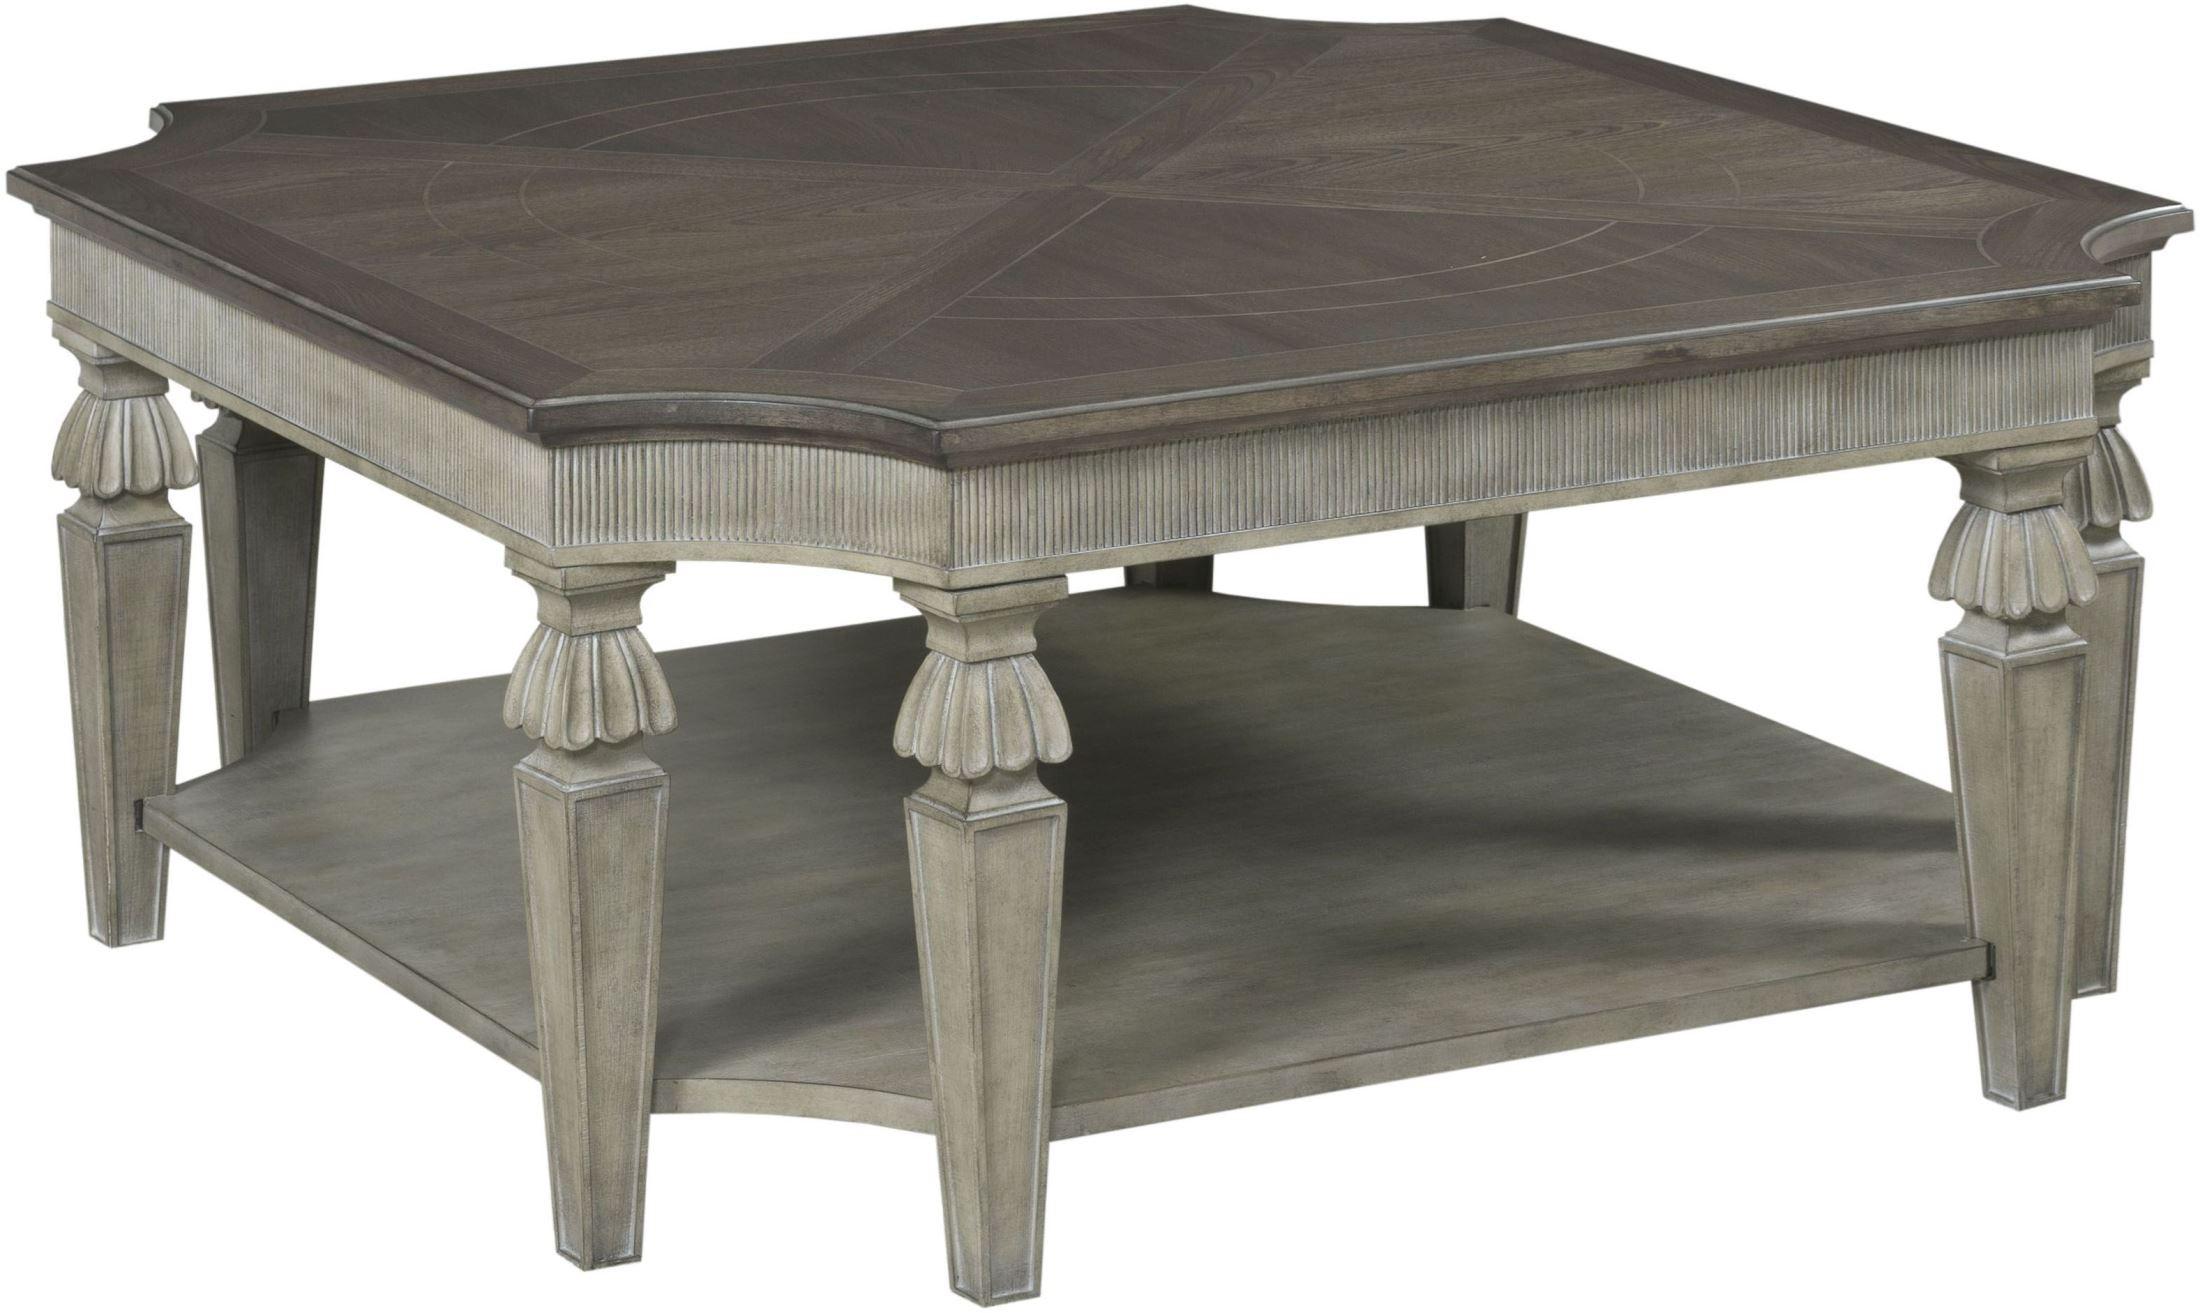 Savona versaille dorothea square cocktail table from for Square cocktail table